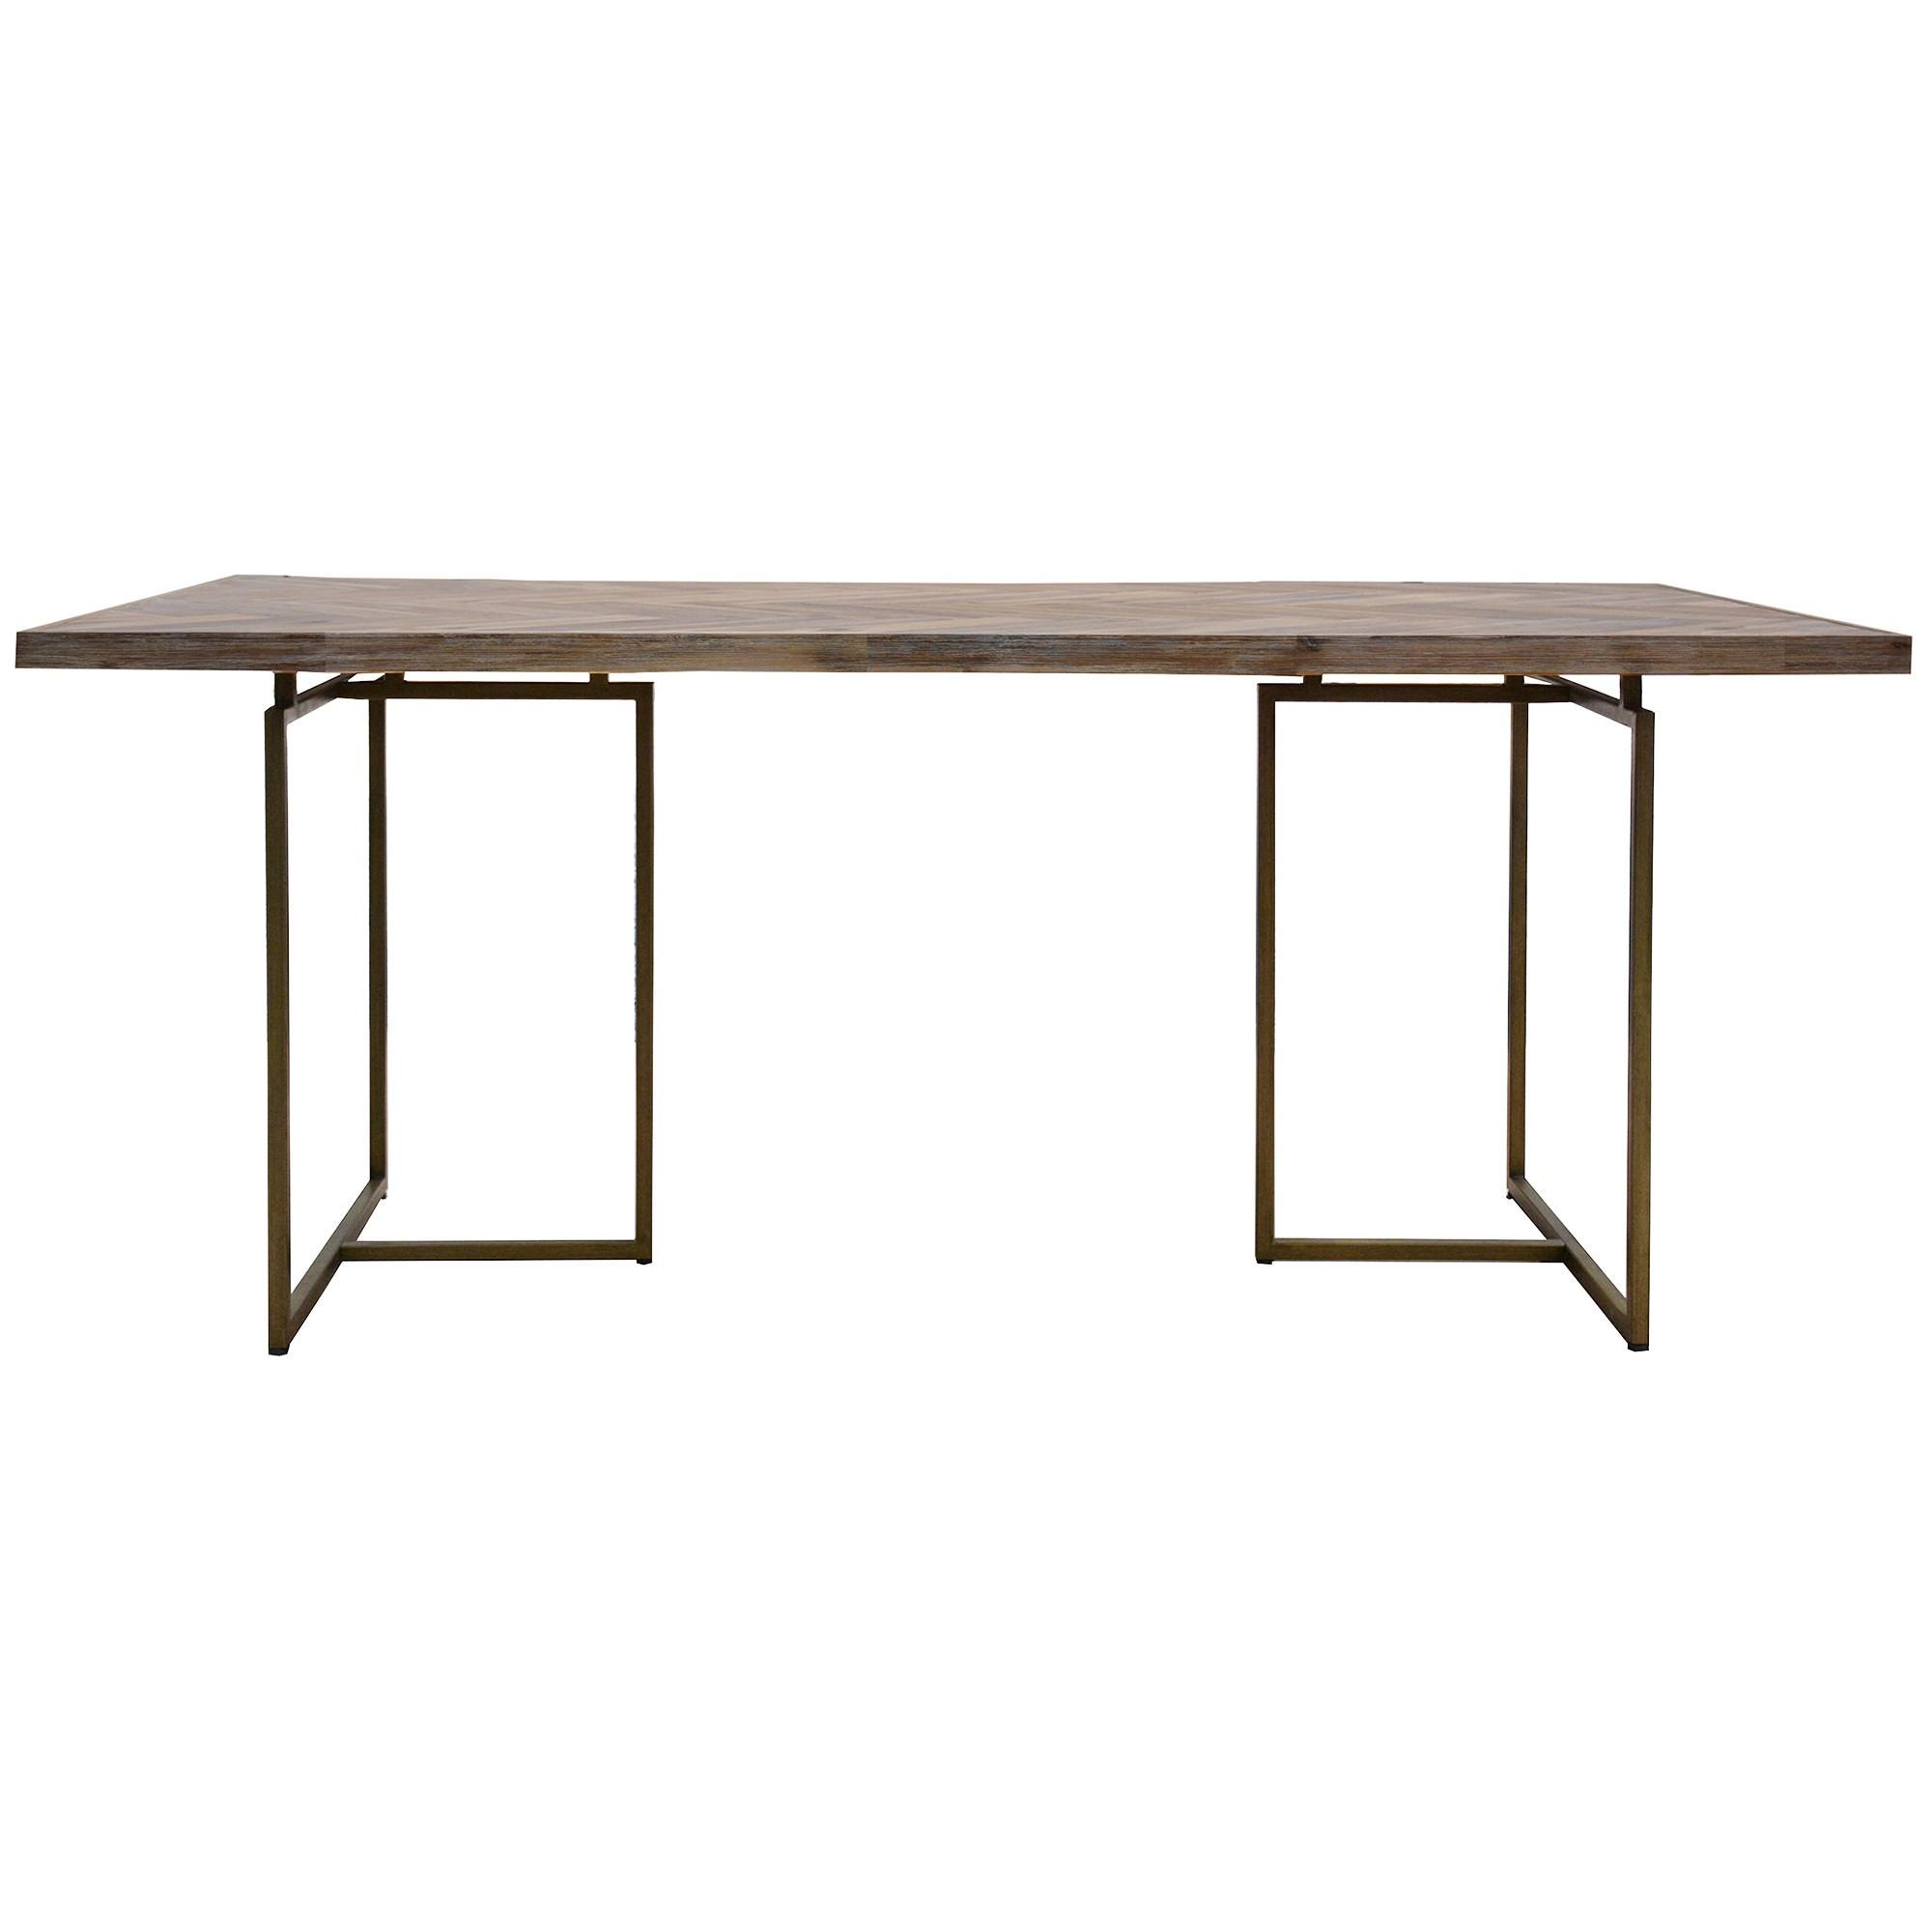 Nona Acacia Timber & Metal Dining Table, 210cm